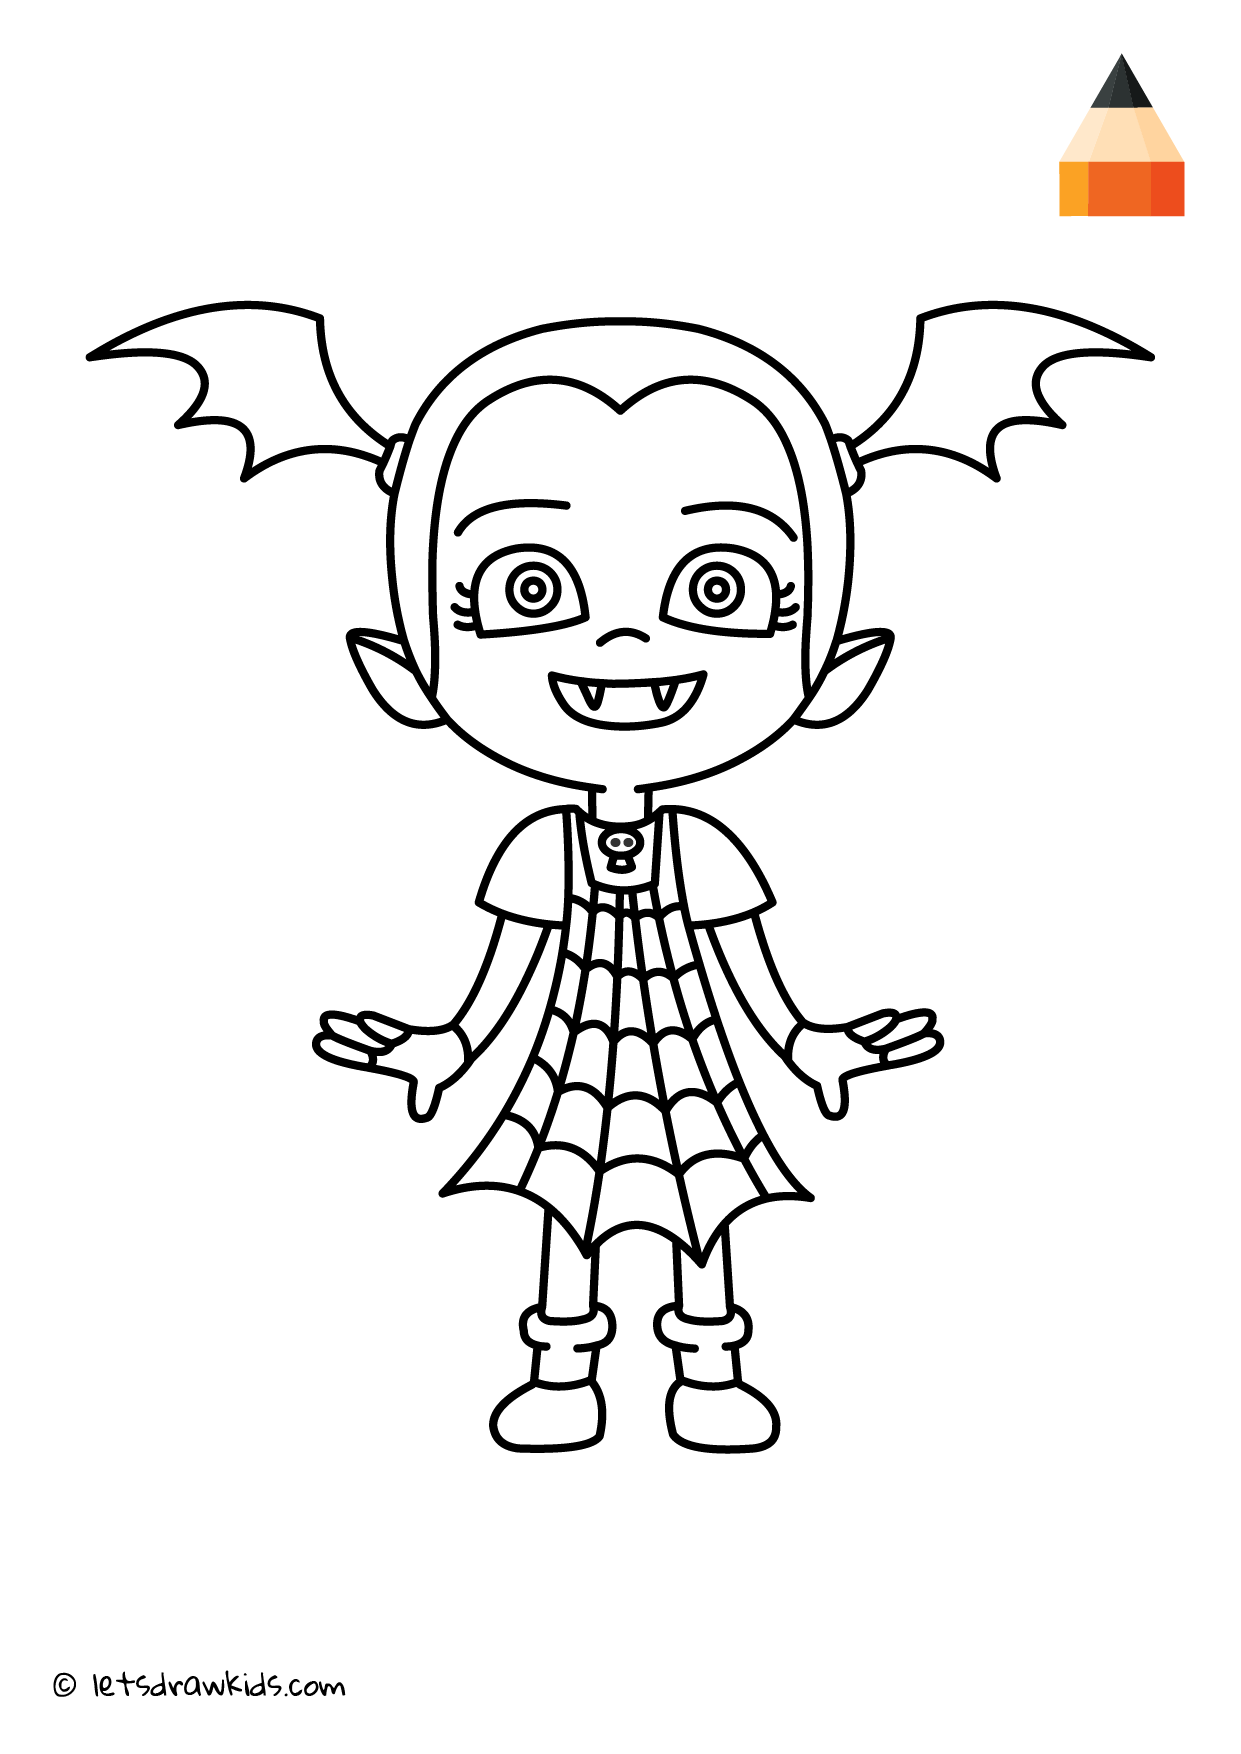 New Coloring Page Vampirina Coloring Pages Leri Co Halloween Para Colorear Dibujos Halloween Colorear Dibujos Para Colorear